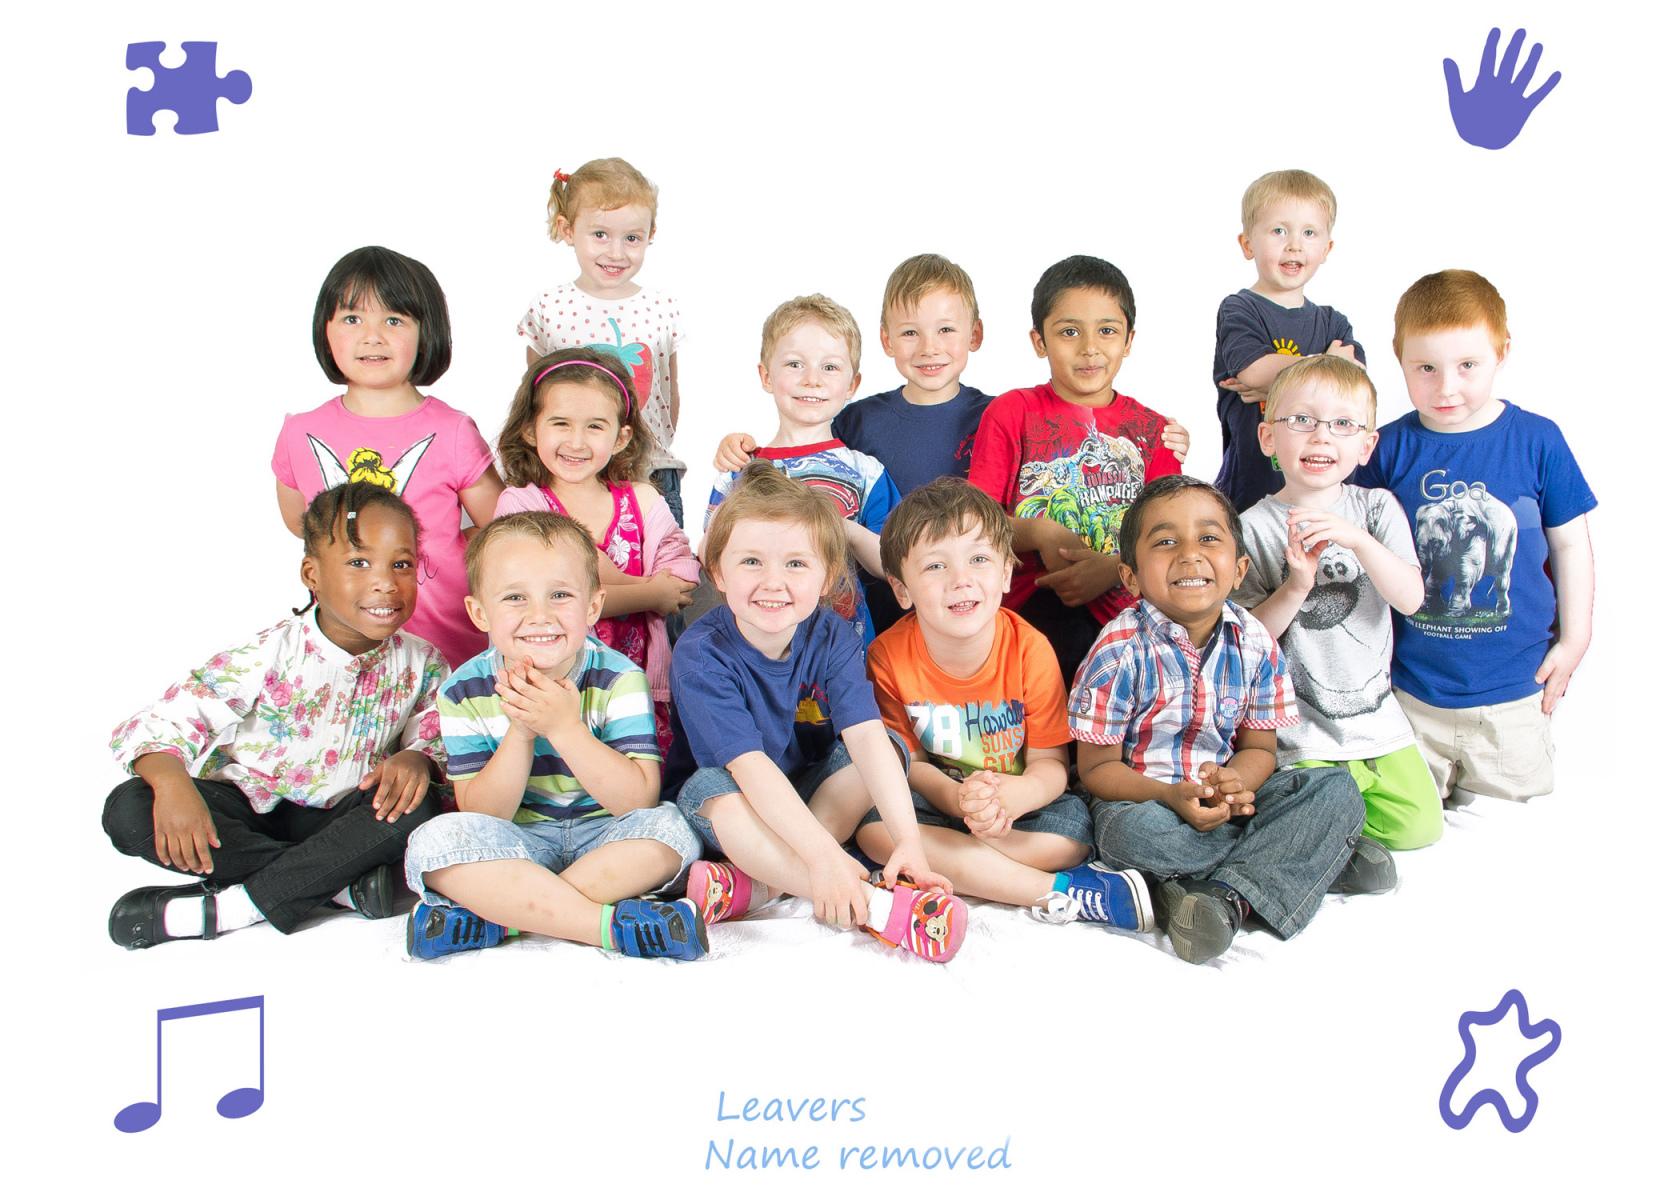 Leavers-groups-Sandra-Sergeant-Schools-Nursery-Photographer-Basingstoke